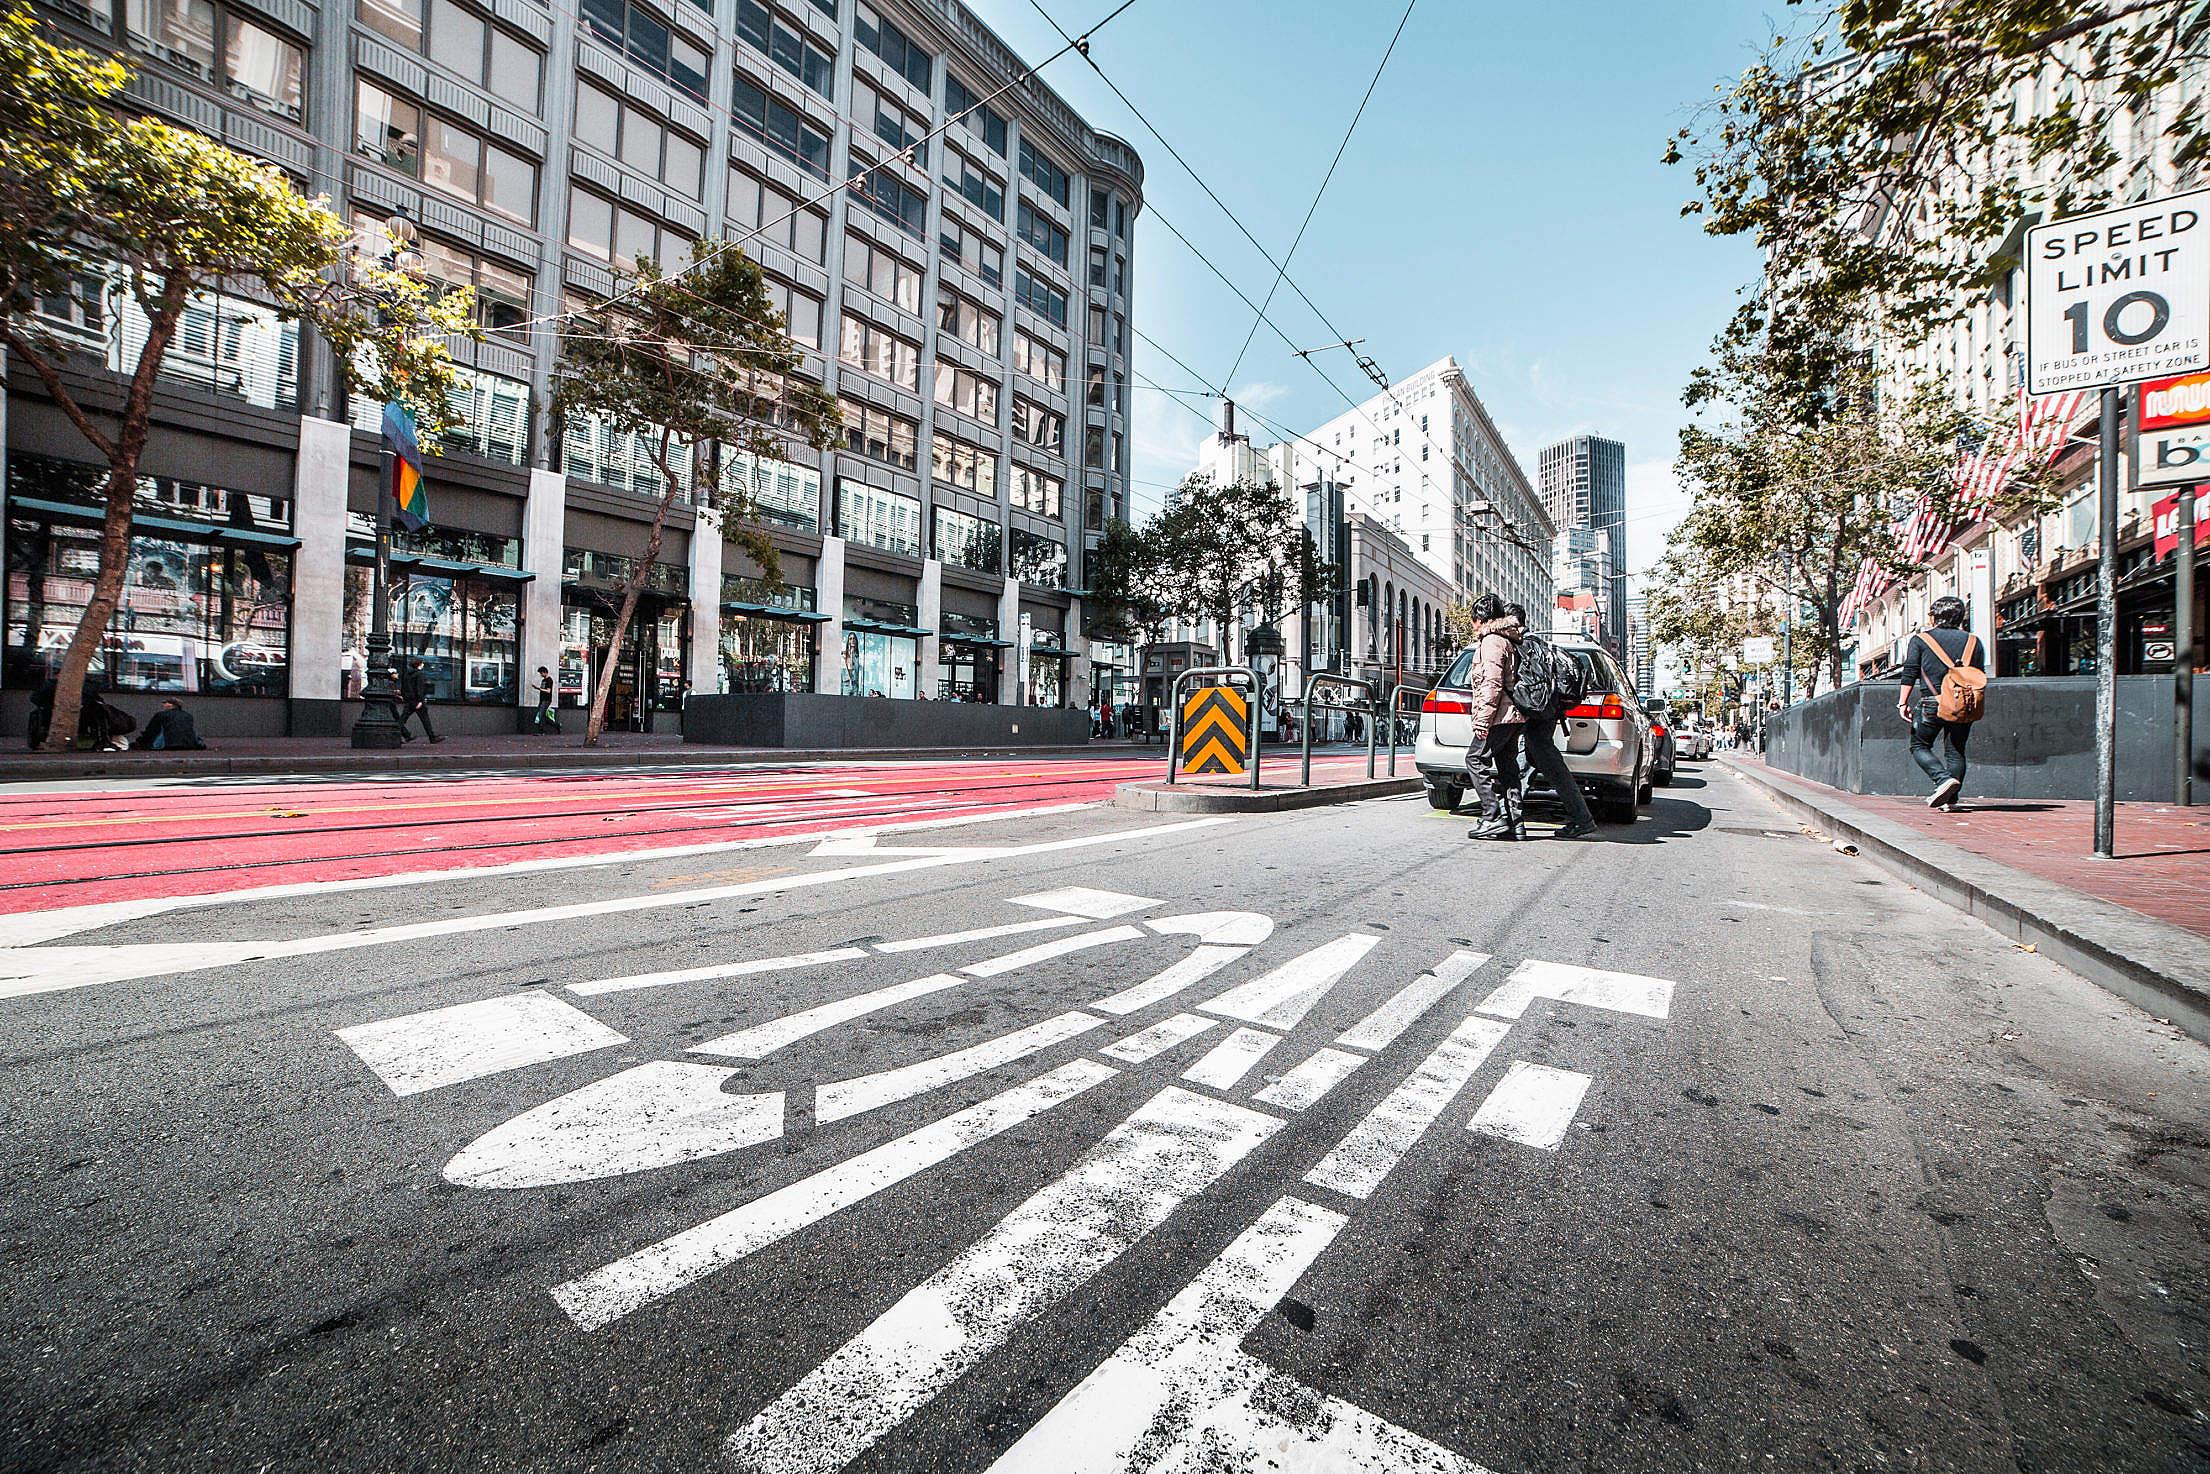 ZONE Road Marking on San Francisco Street Free Stock Photo